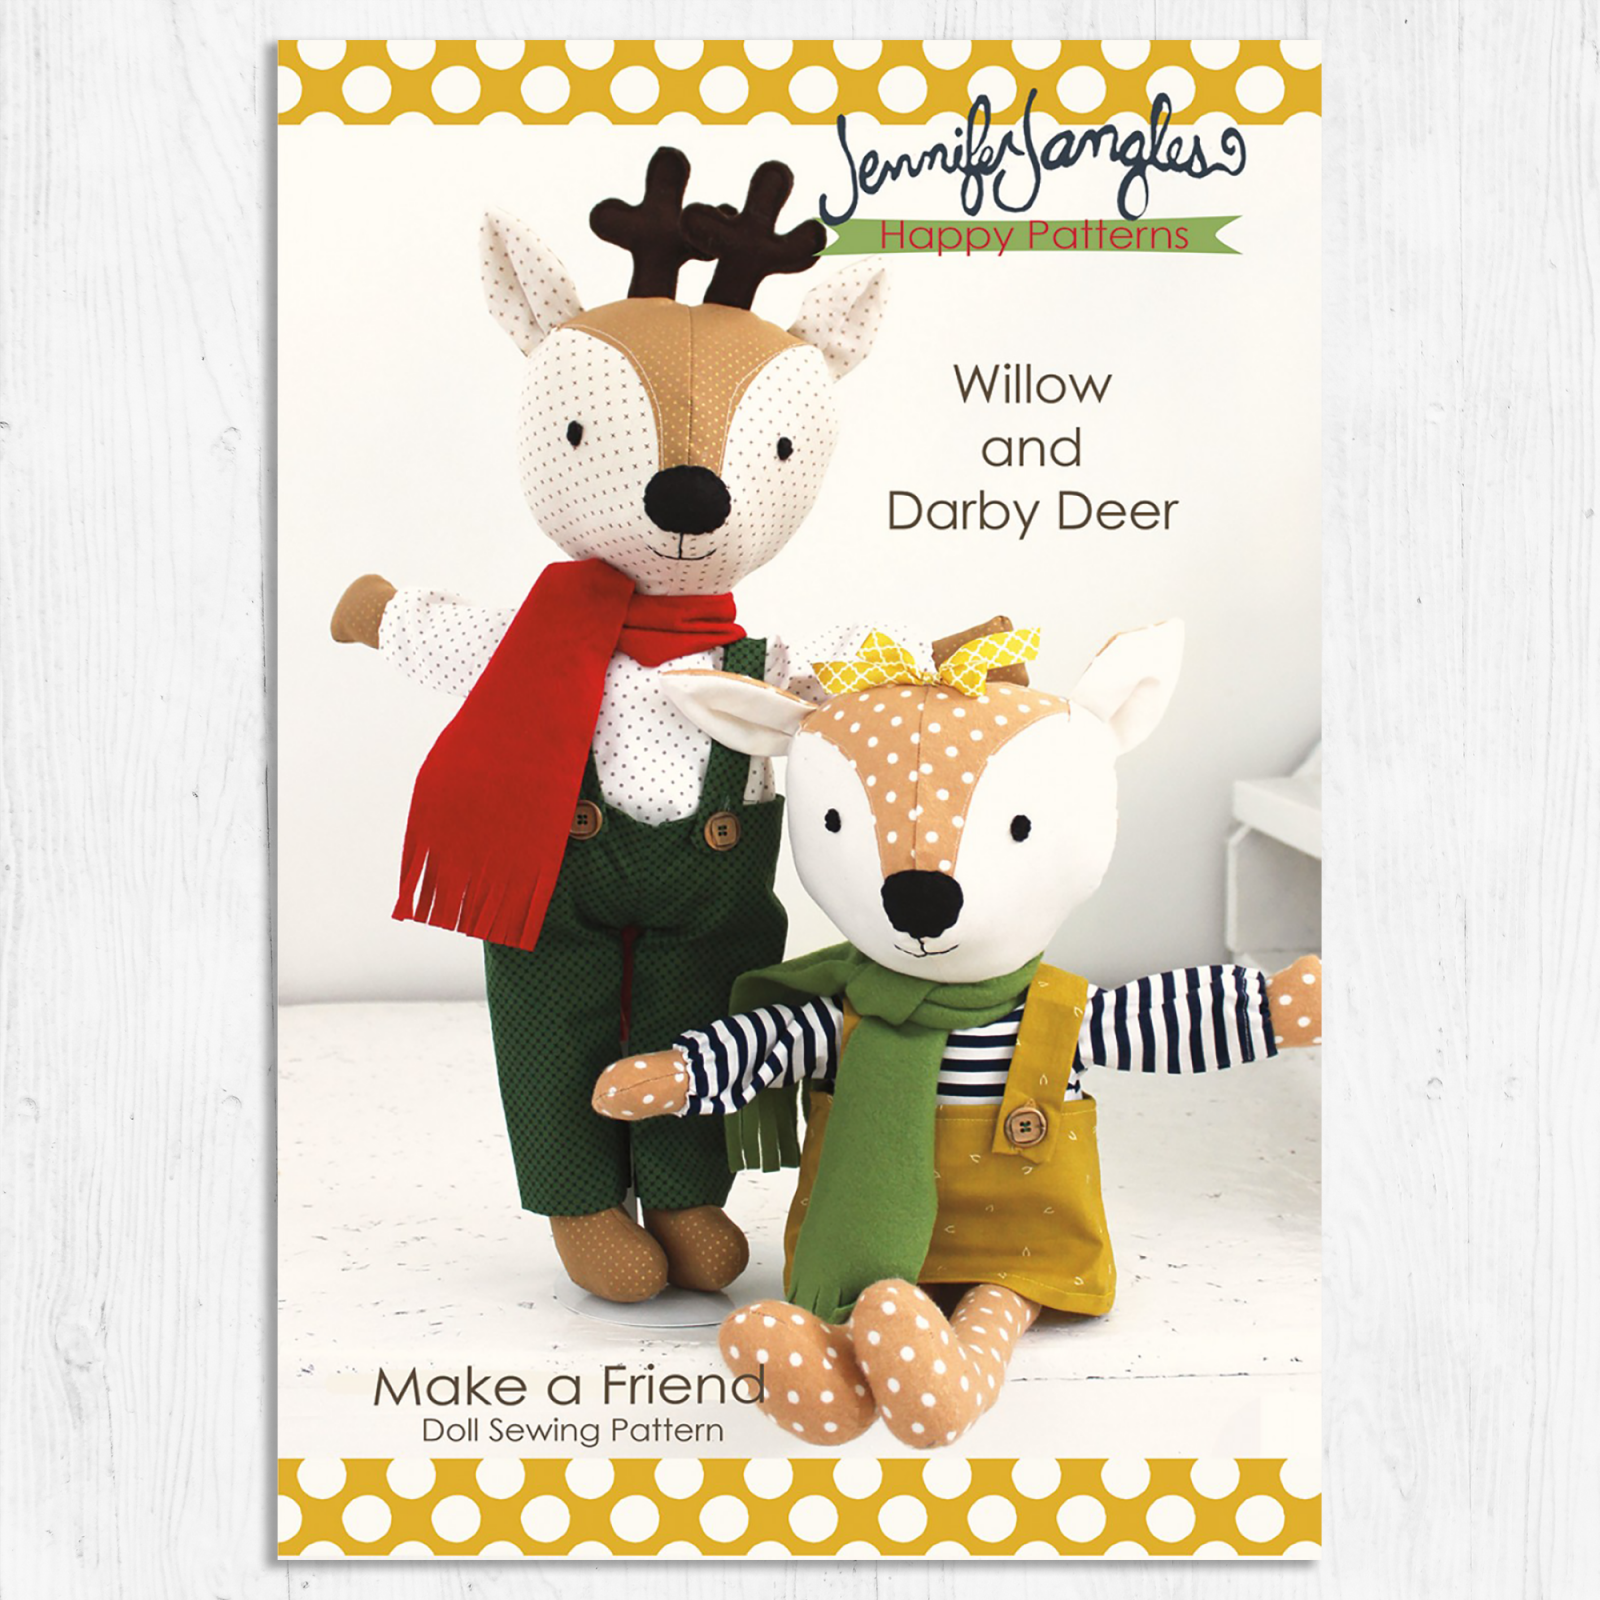 Make a Friend - Willow & Darby Deer